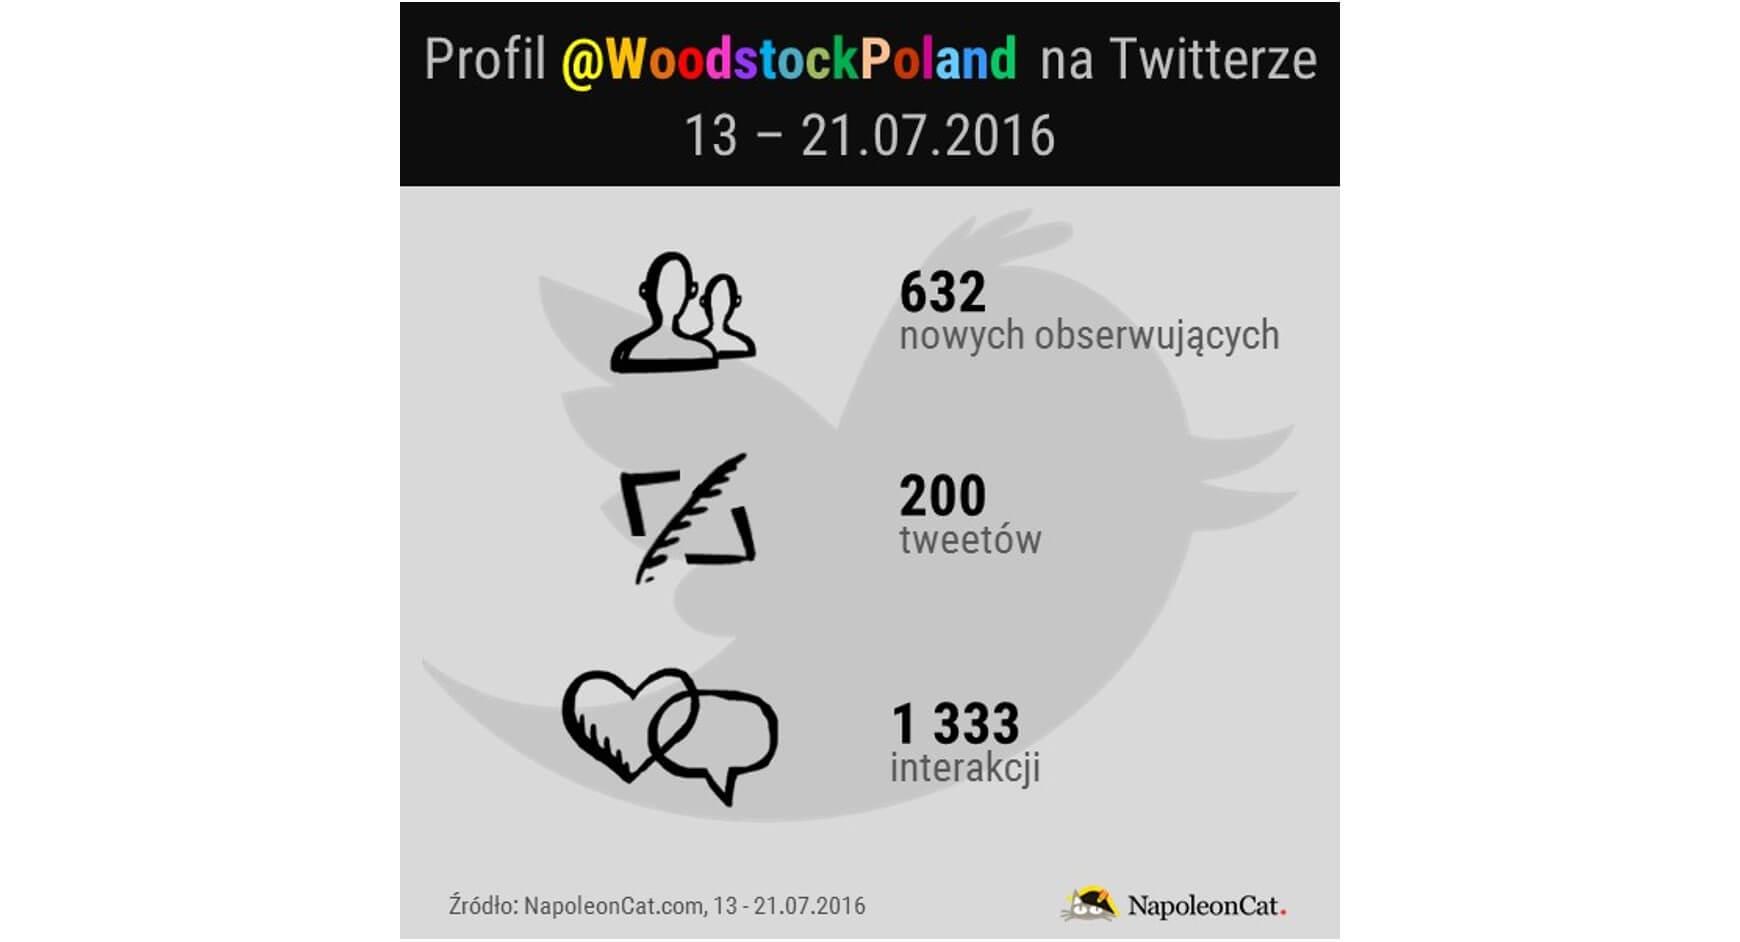 Profil Woodstock Poland na Twitterze_13-21.07.2016_NapoleonCat.com blog